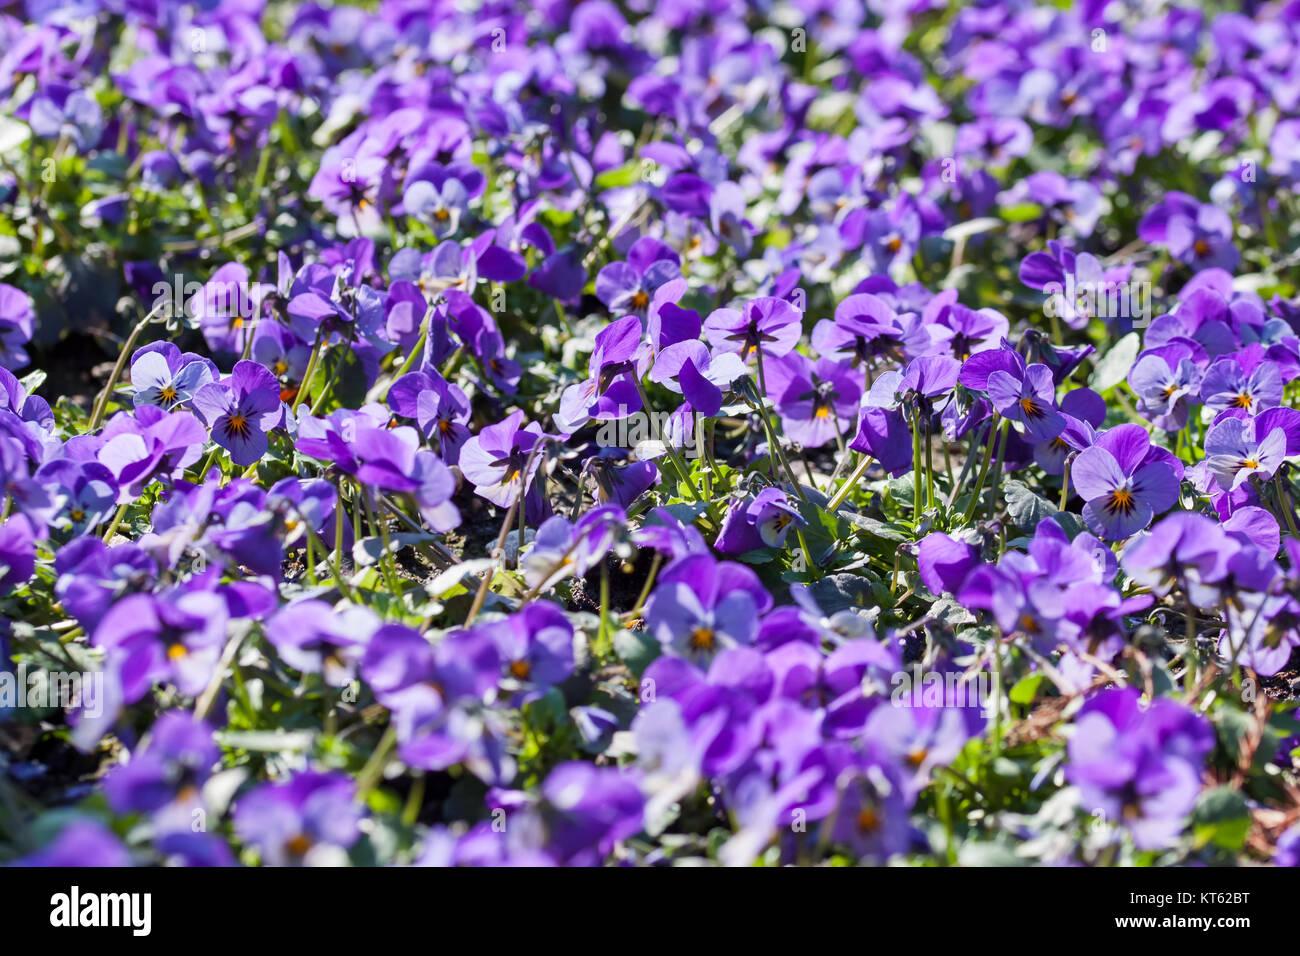 Ein Blütenmeer - lilafarbene Stiefmütterchen Stock Photo